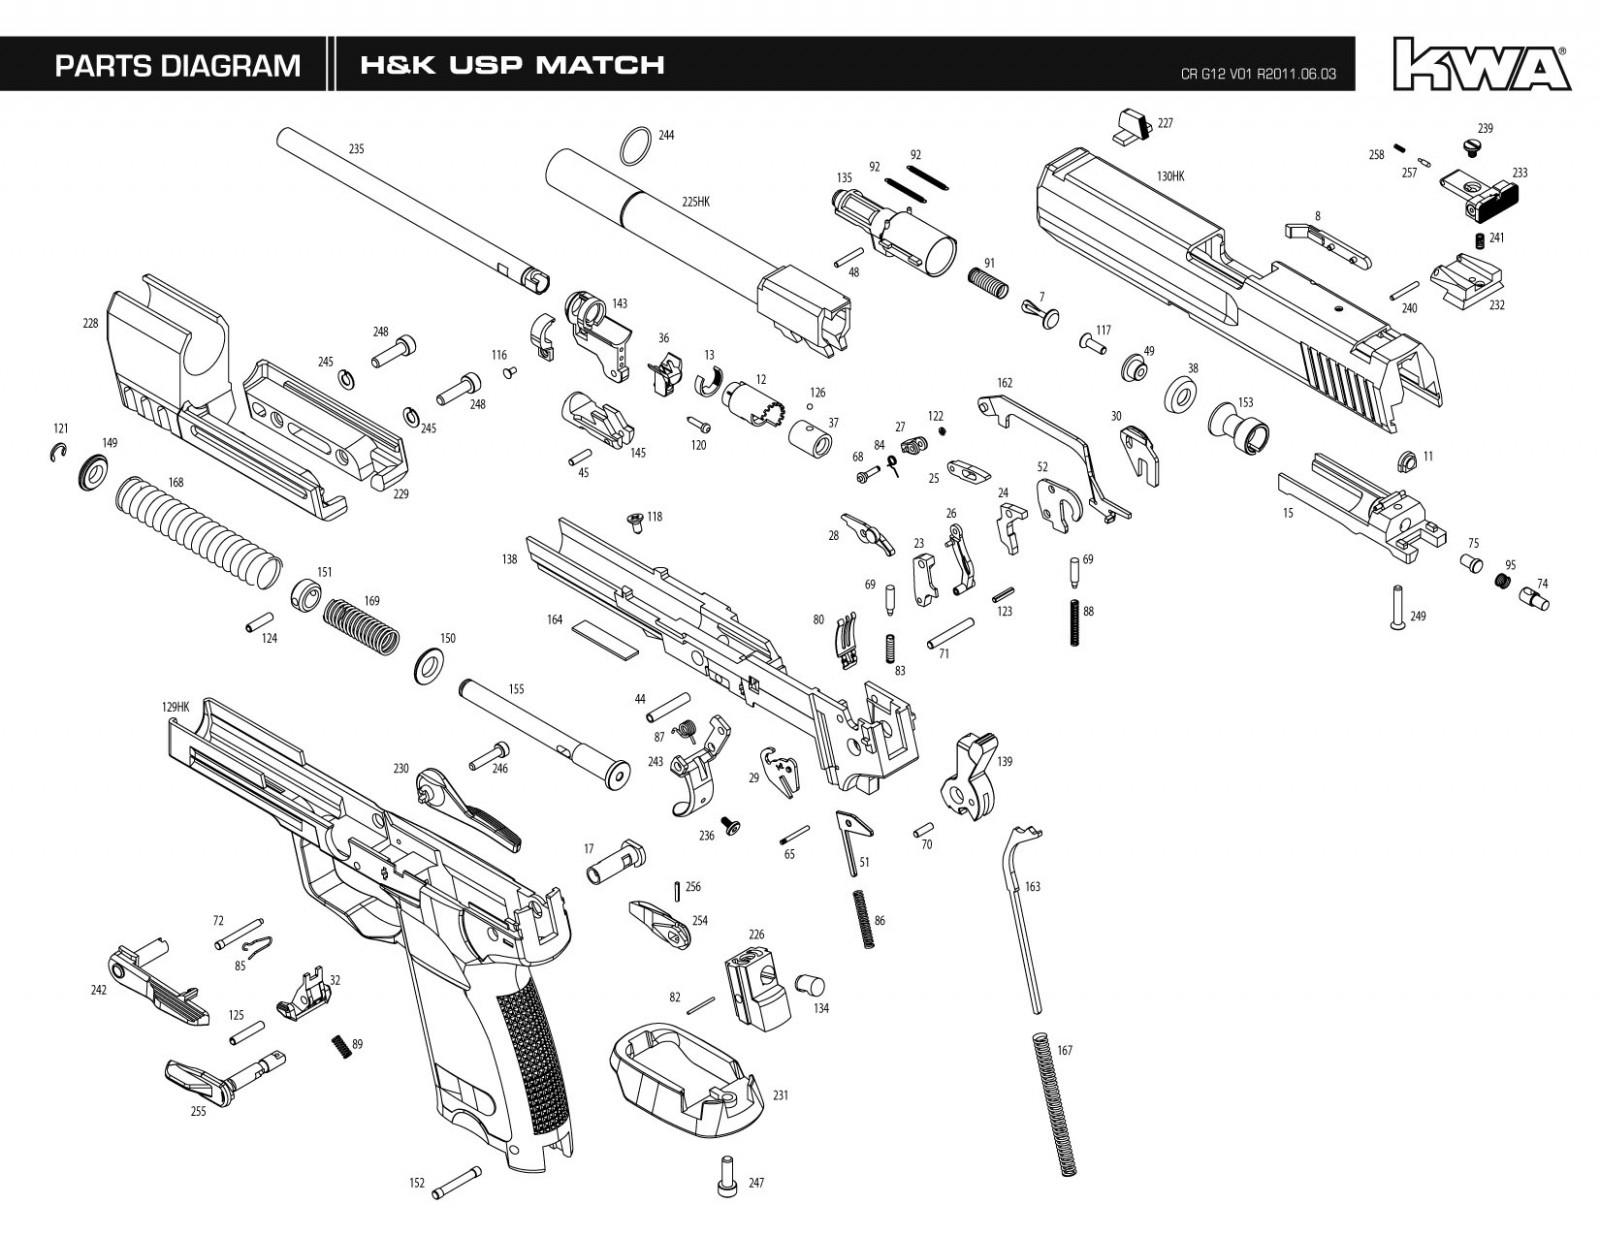 Kwa Umarex Usp Match Exploded Diagram Ksc Part Original Worldwide Shipping